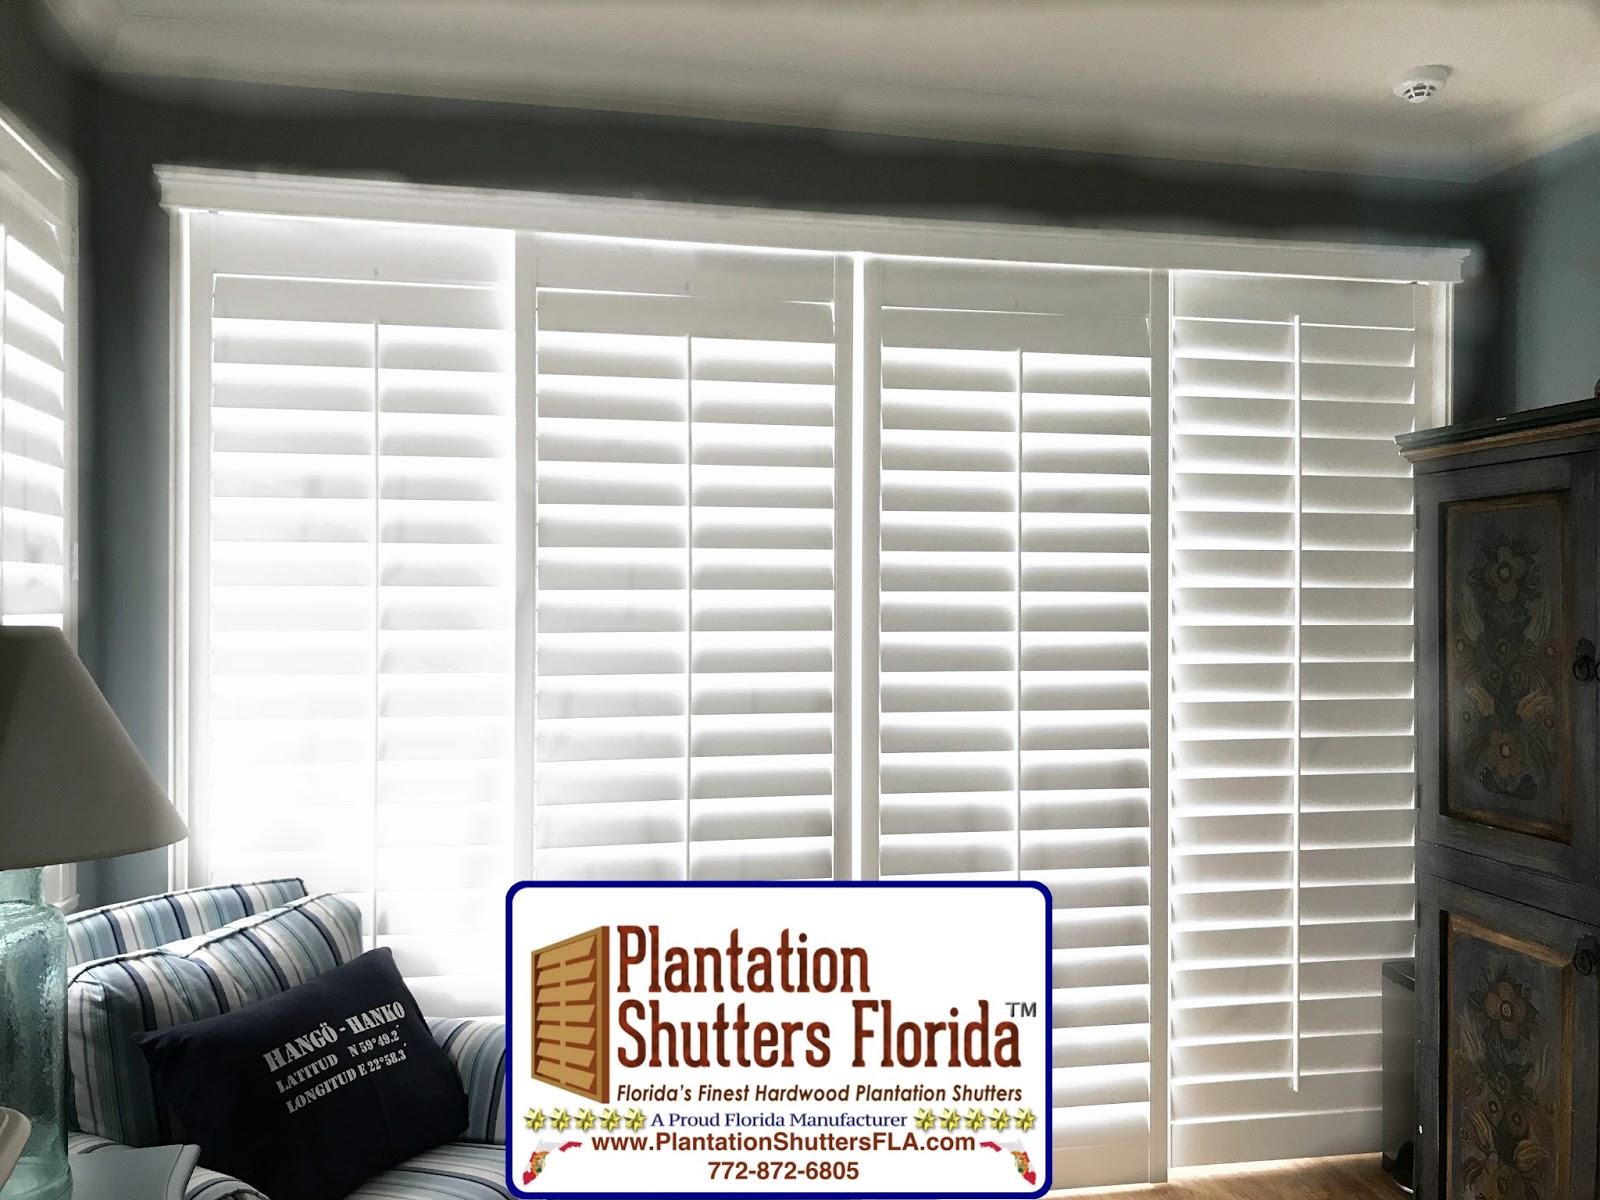 Plantation Shutters West Palm Beach Florida Plantation Shutters Made In America